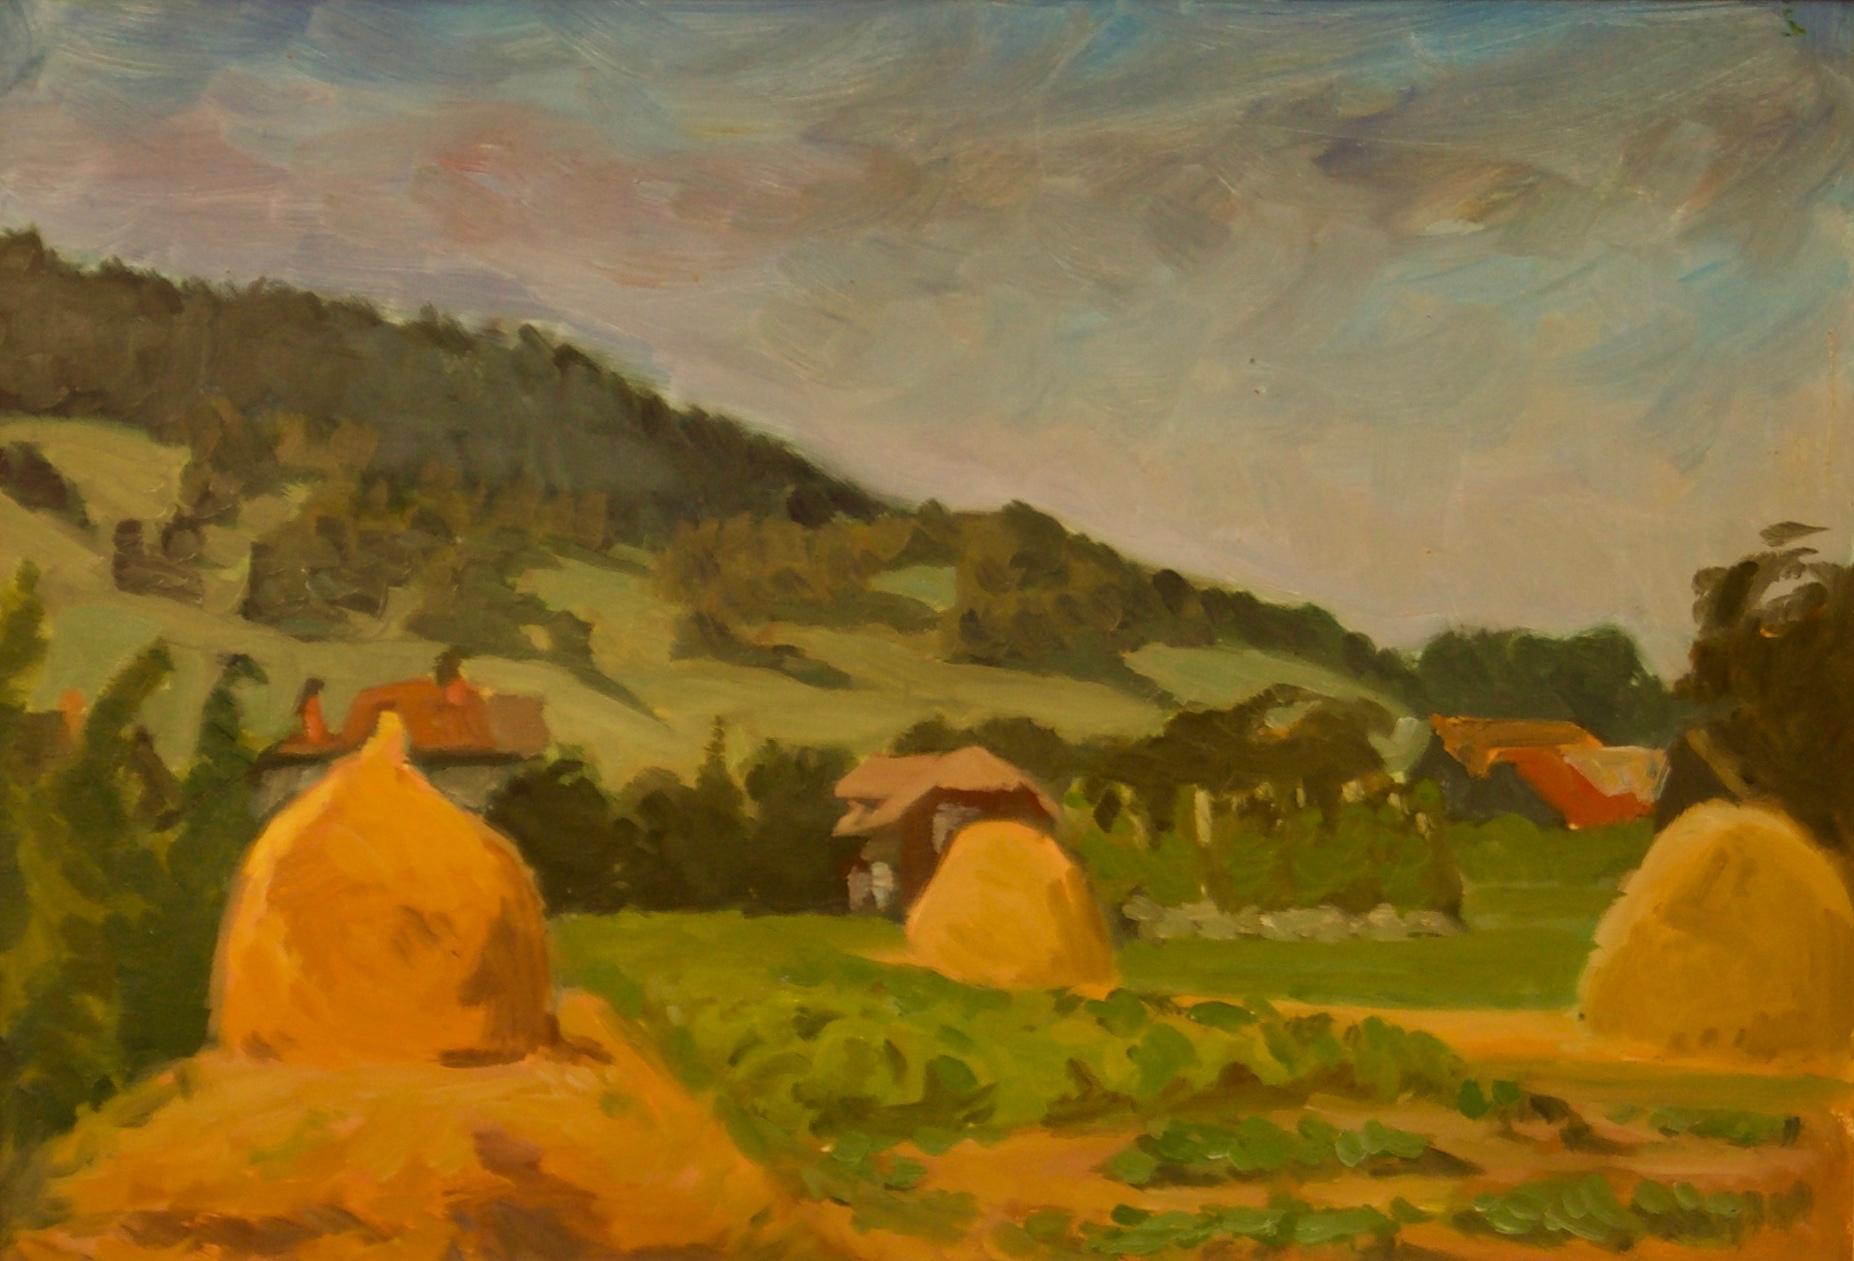 Pogorze Foothills - Mid 20th Century Oil Painting by Helena Krajewska - Poland